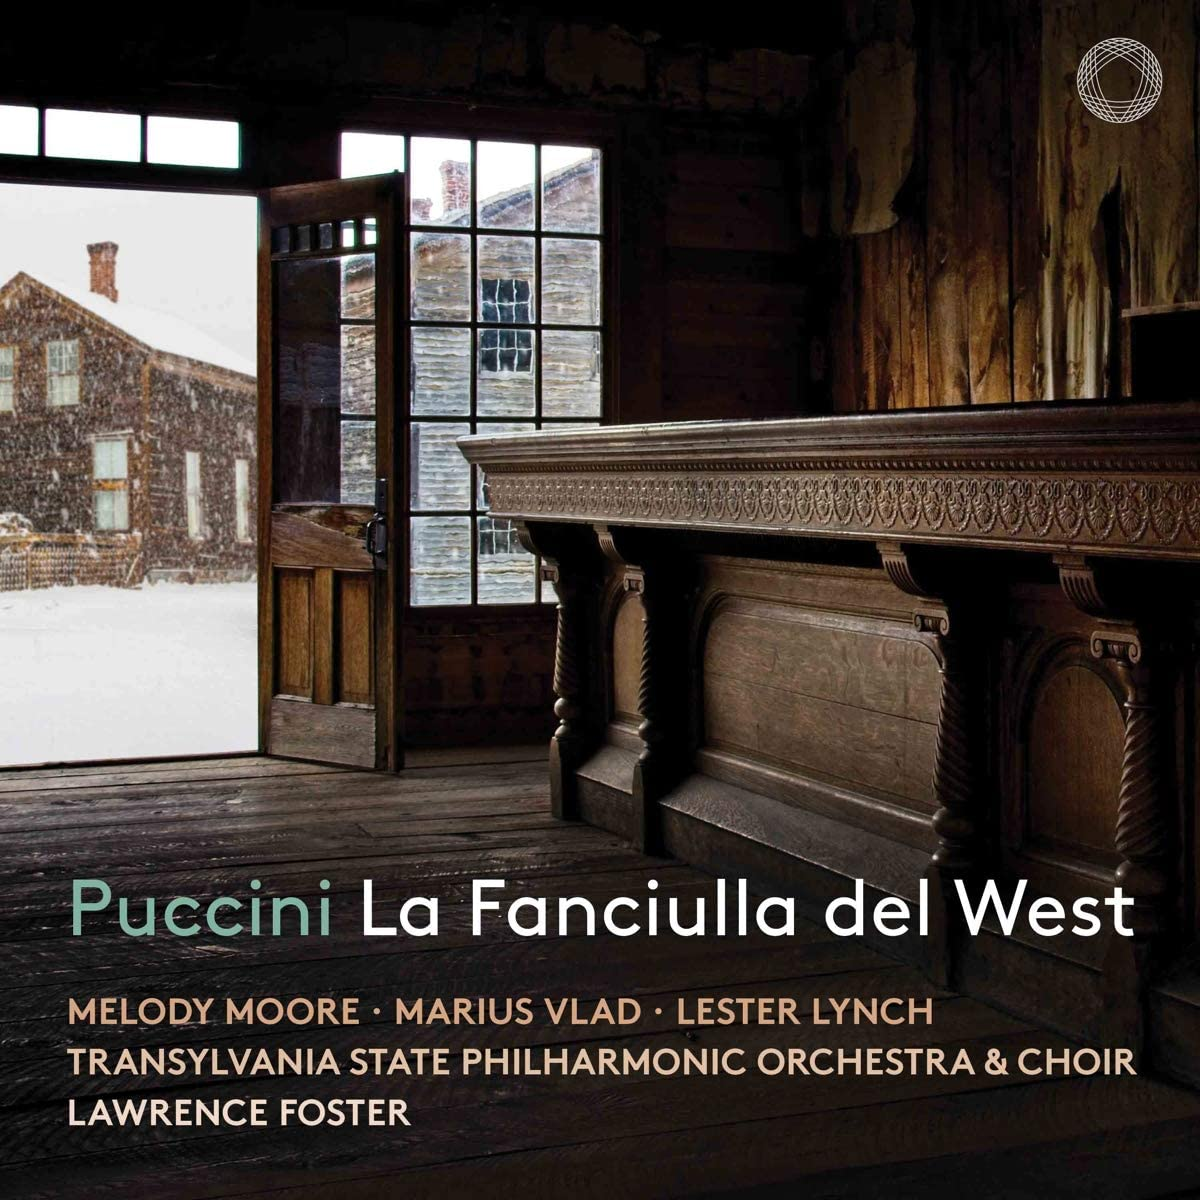 Review of PUCCINI La Fanciulla del West (Foster)